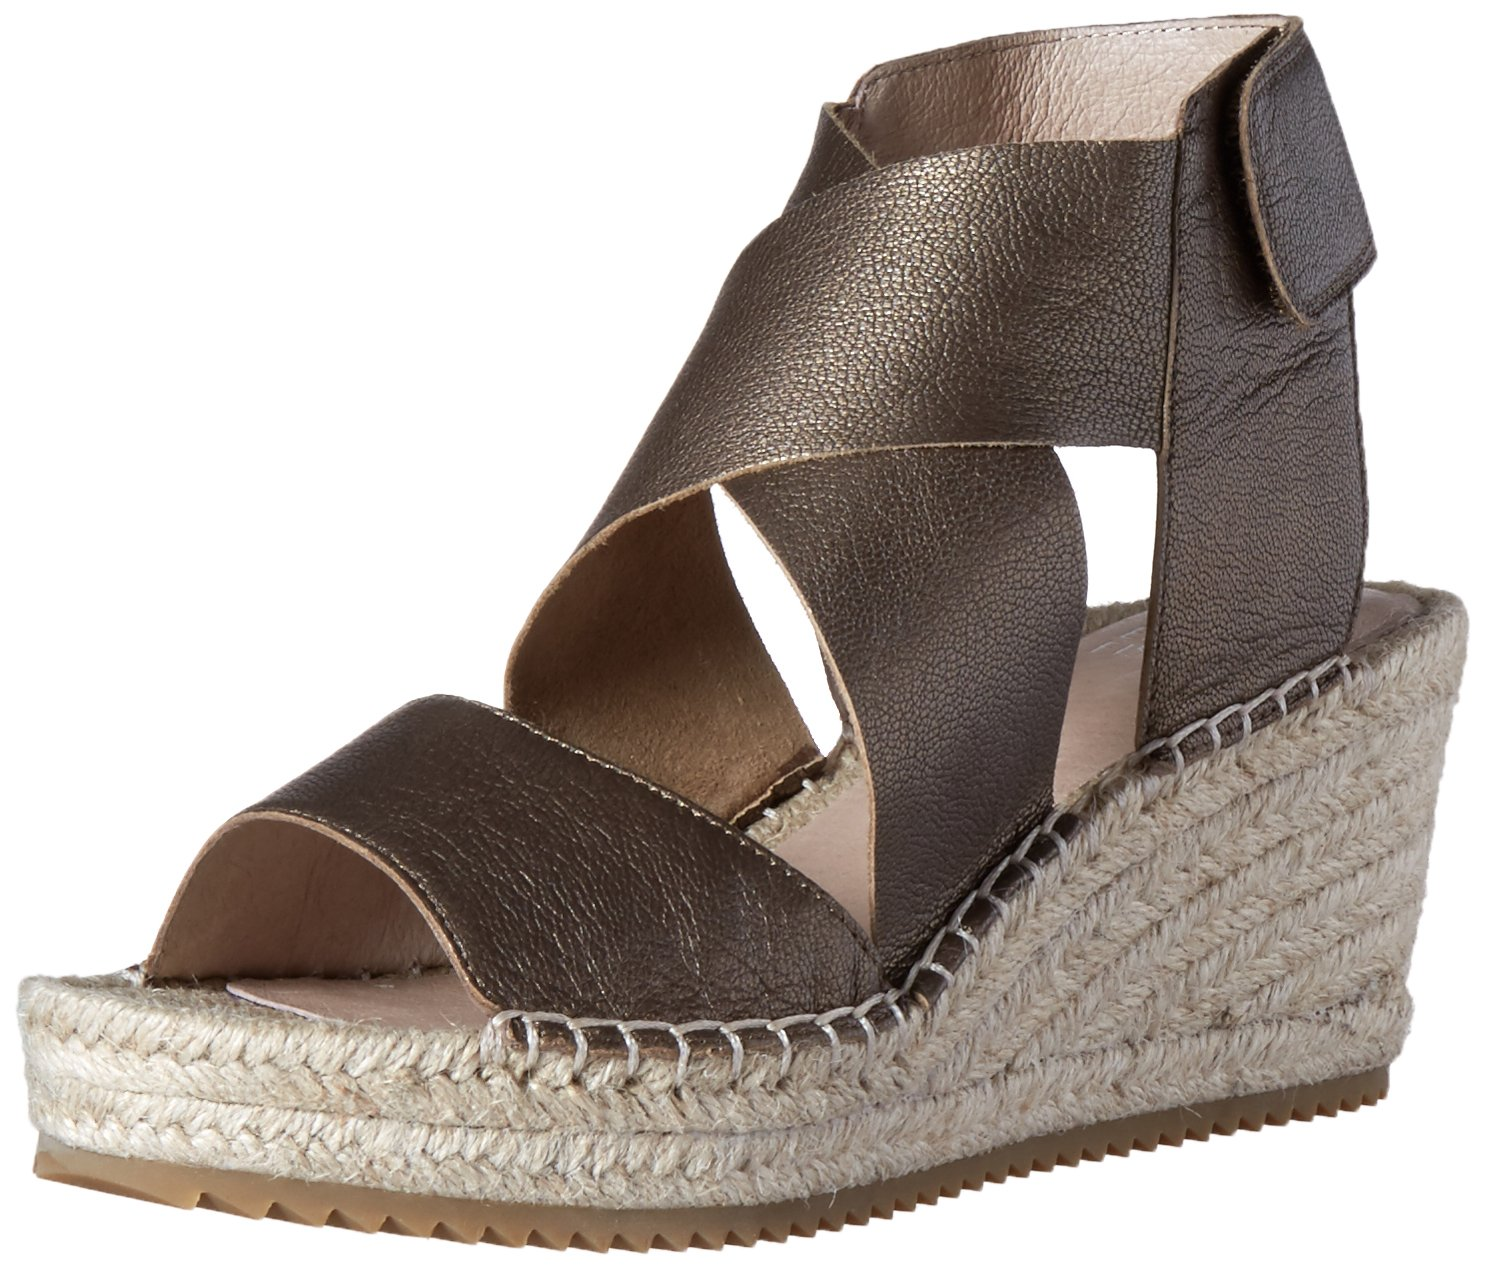 Eileen Fisher Women's Willow-ml Espadrille Wedge Sandal B01HPZCVC2 9.5 B(M) US|Bronze